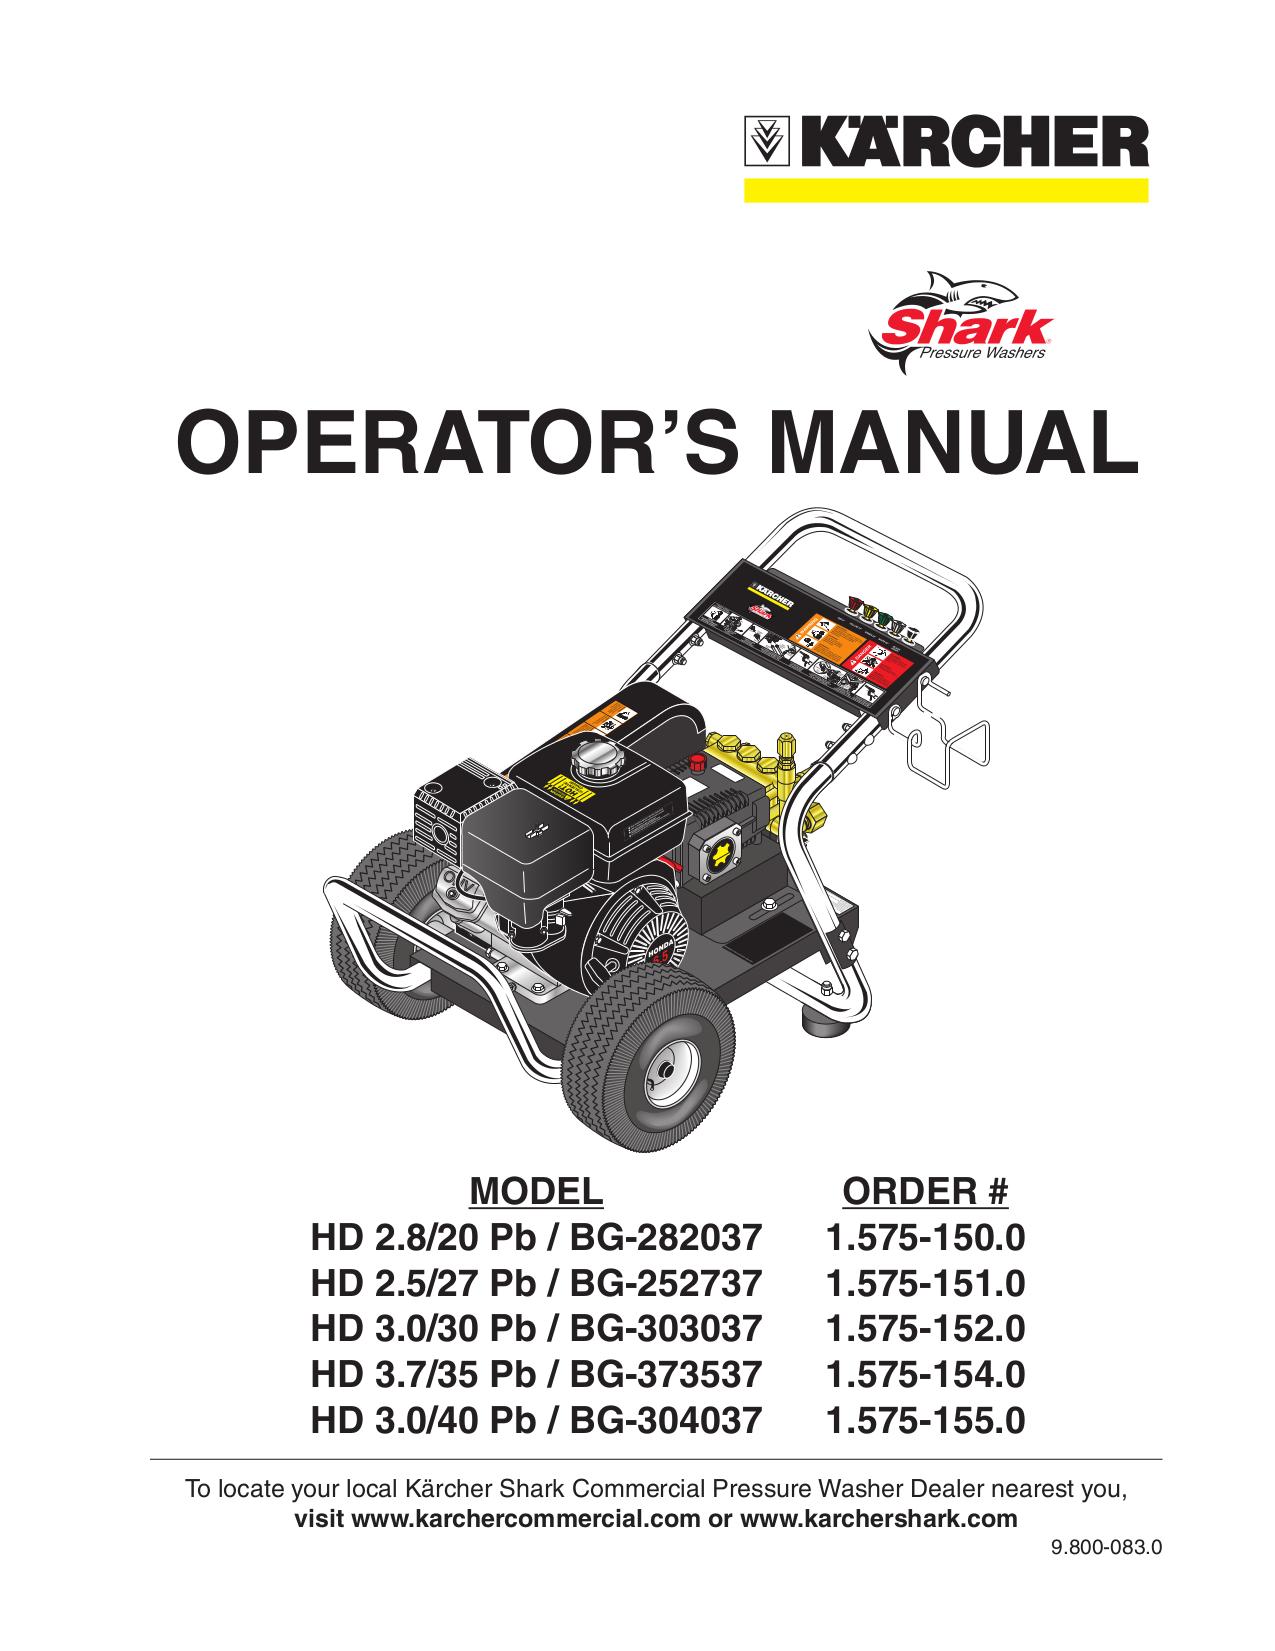 Download Free Pdf For Karcher Hd 3500 Db Pressure Washers